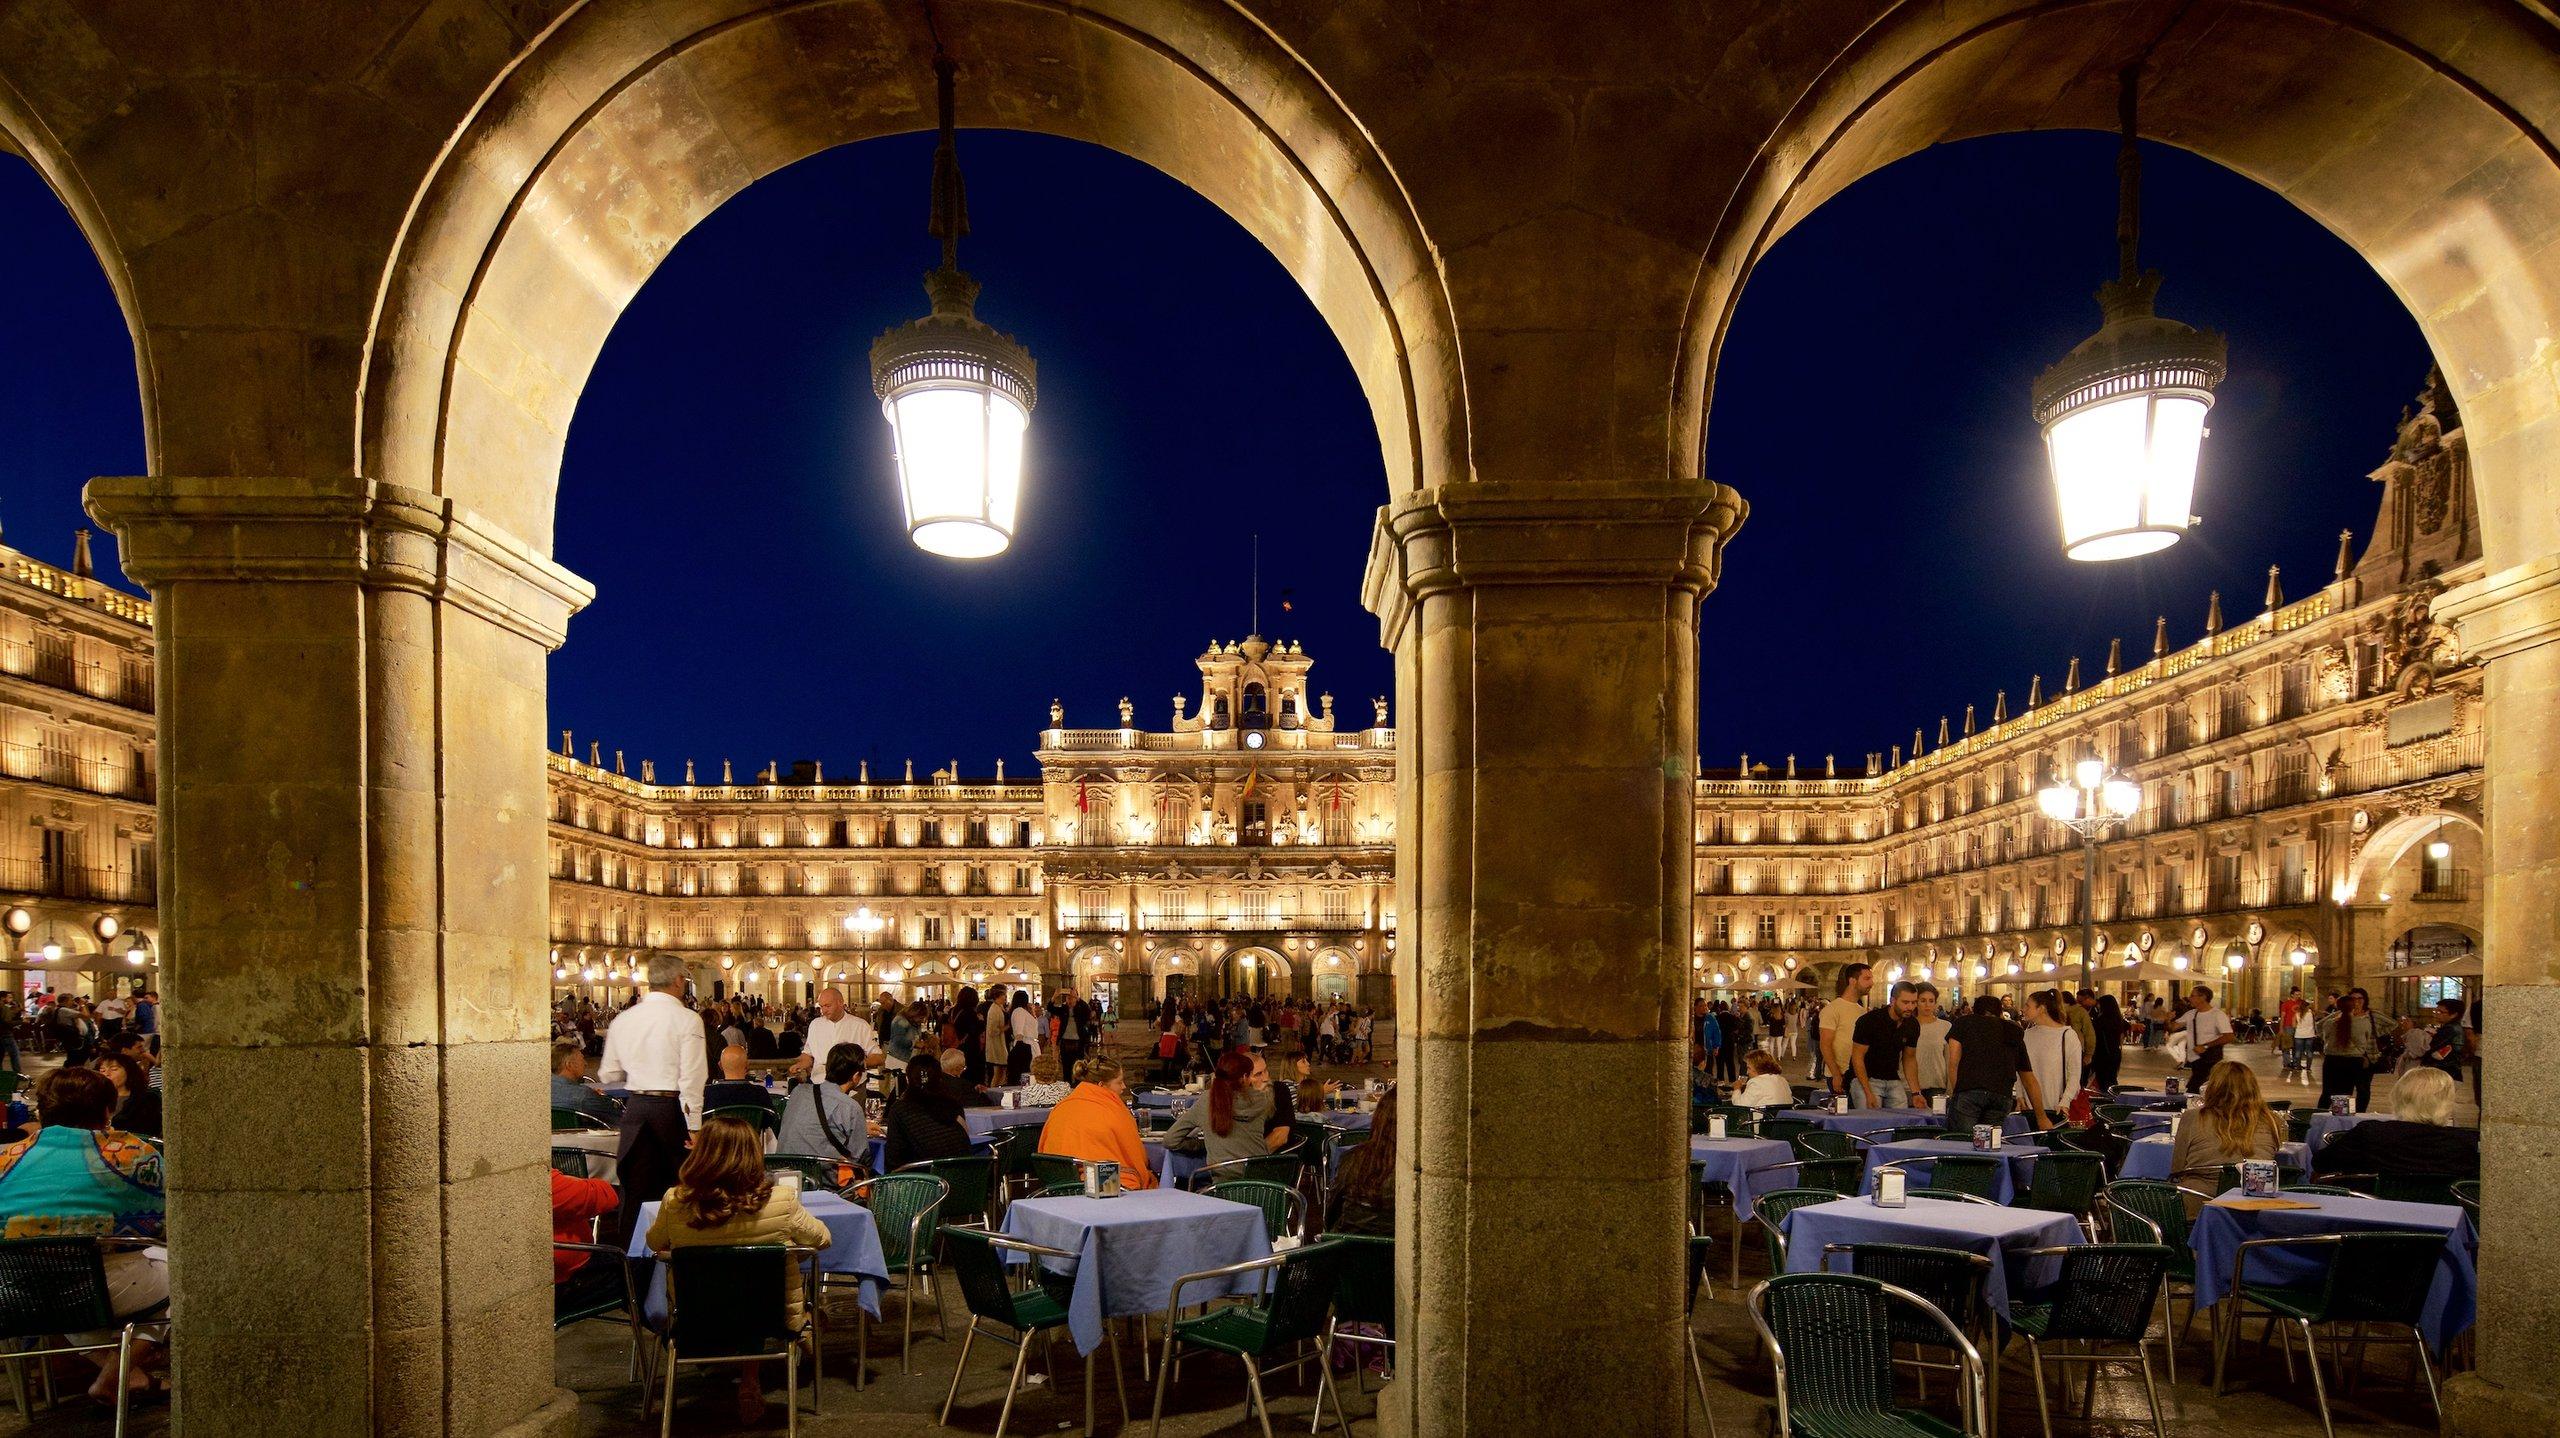 Salamanca Province, Castile and Leon, Spain